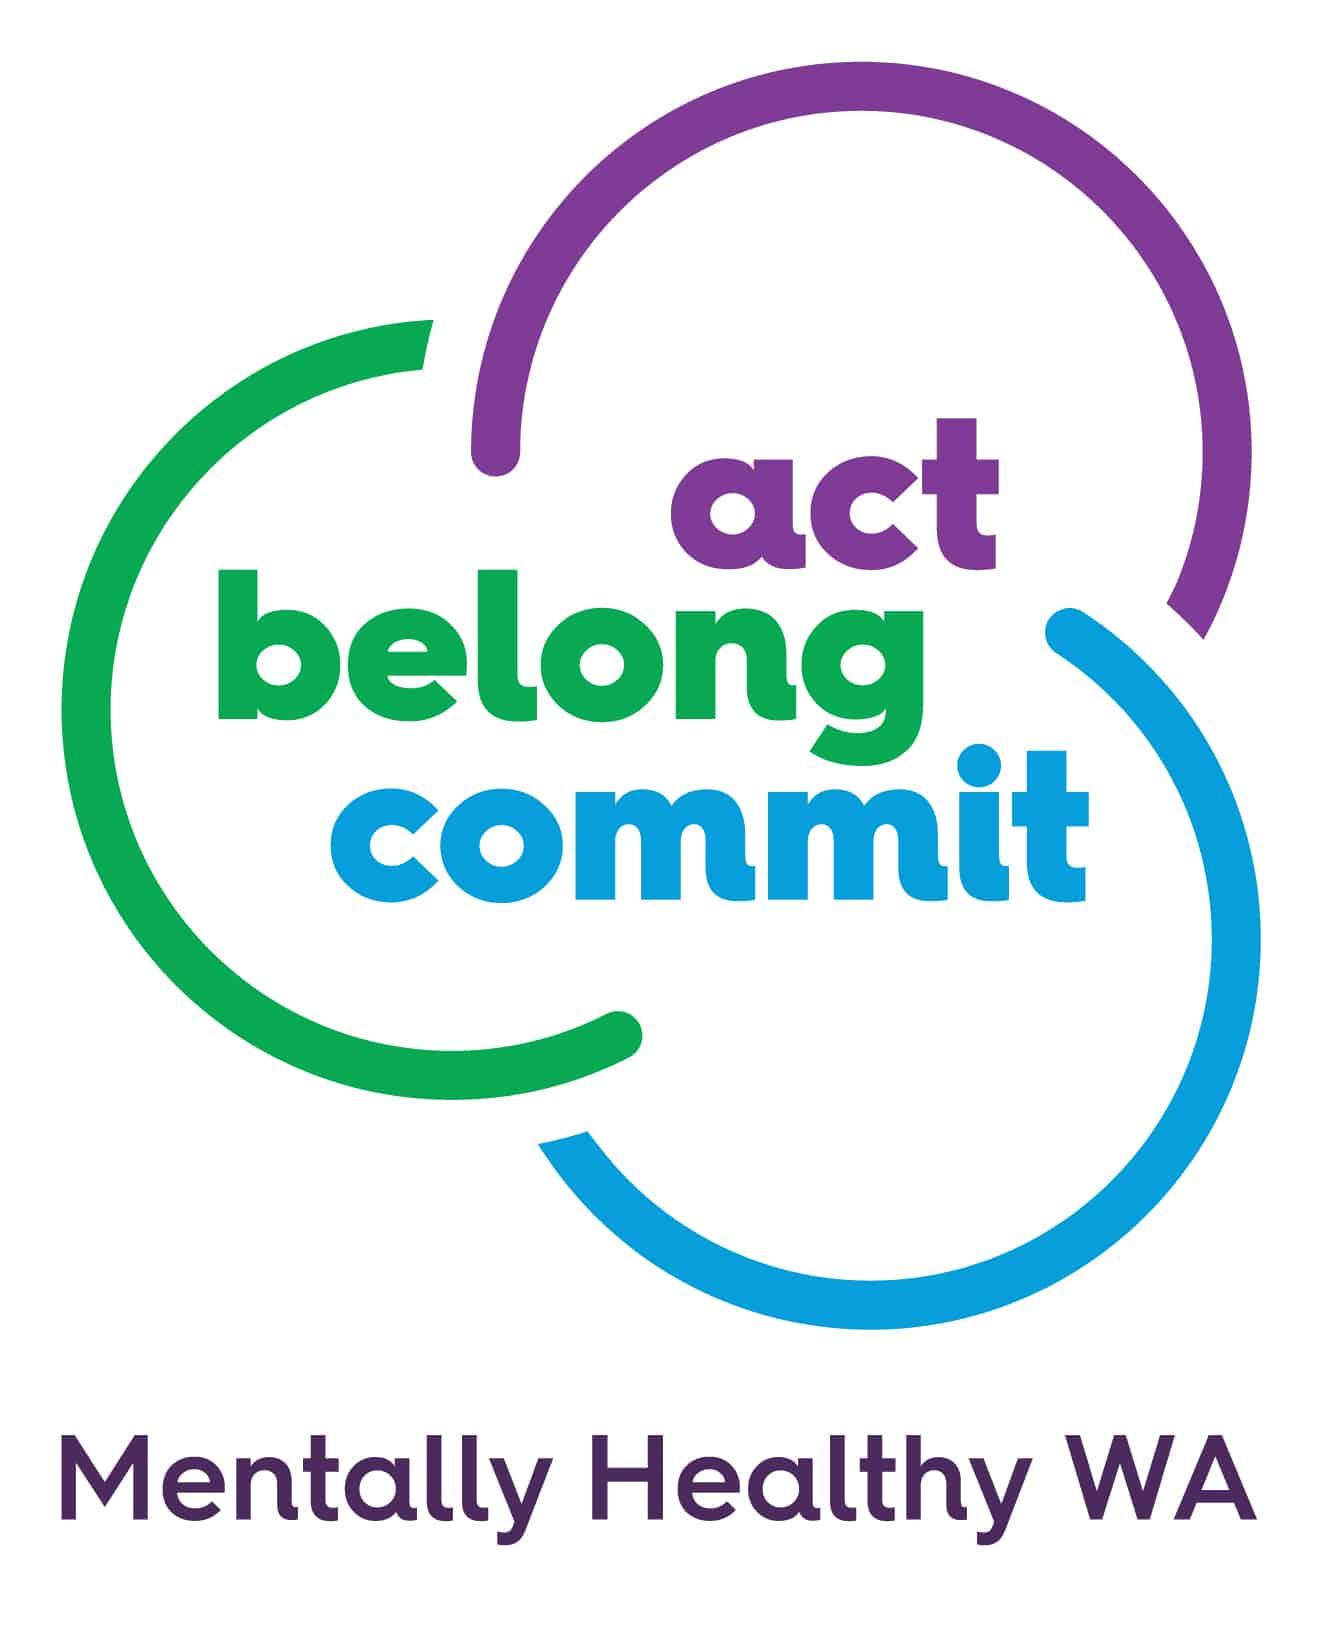 ACT BELONG COMMIT MHWA logo